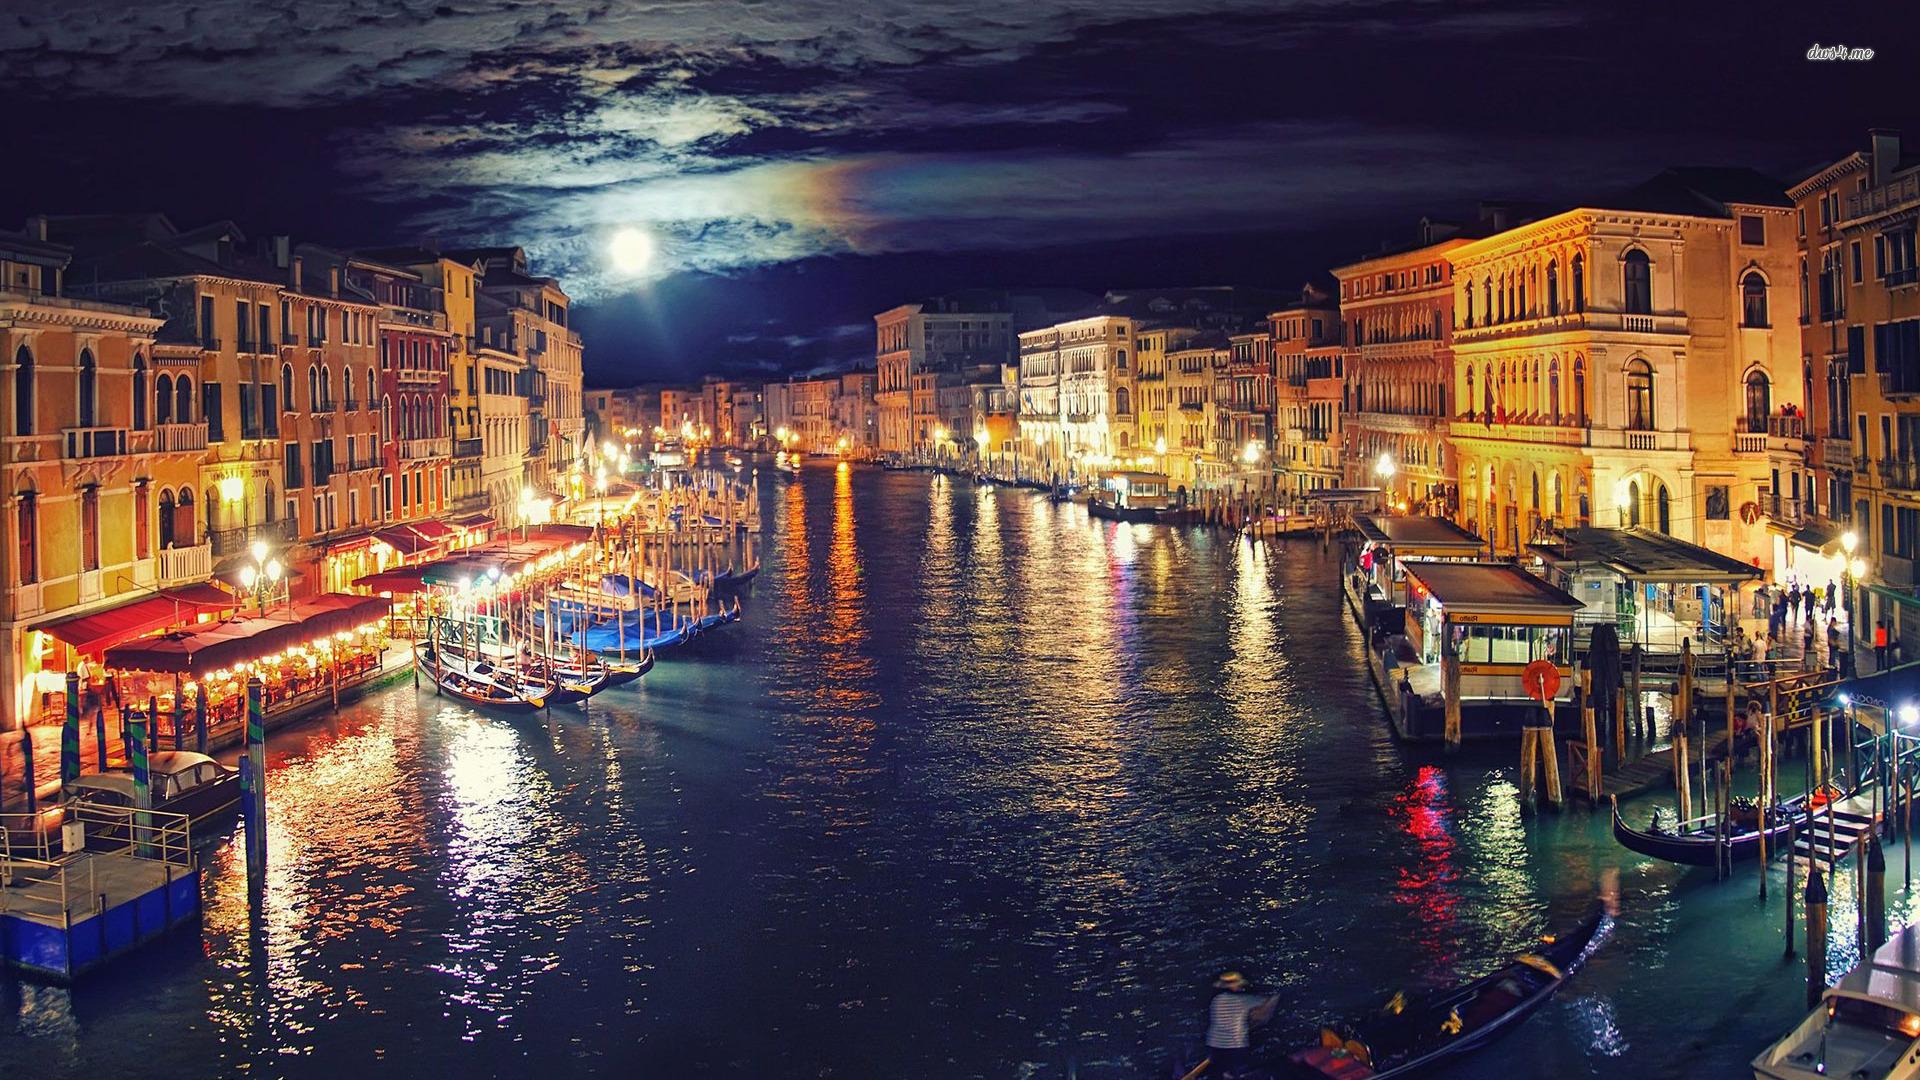 Venice at night wallpaper   World wallpapers   23861 1920x1080